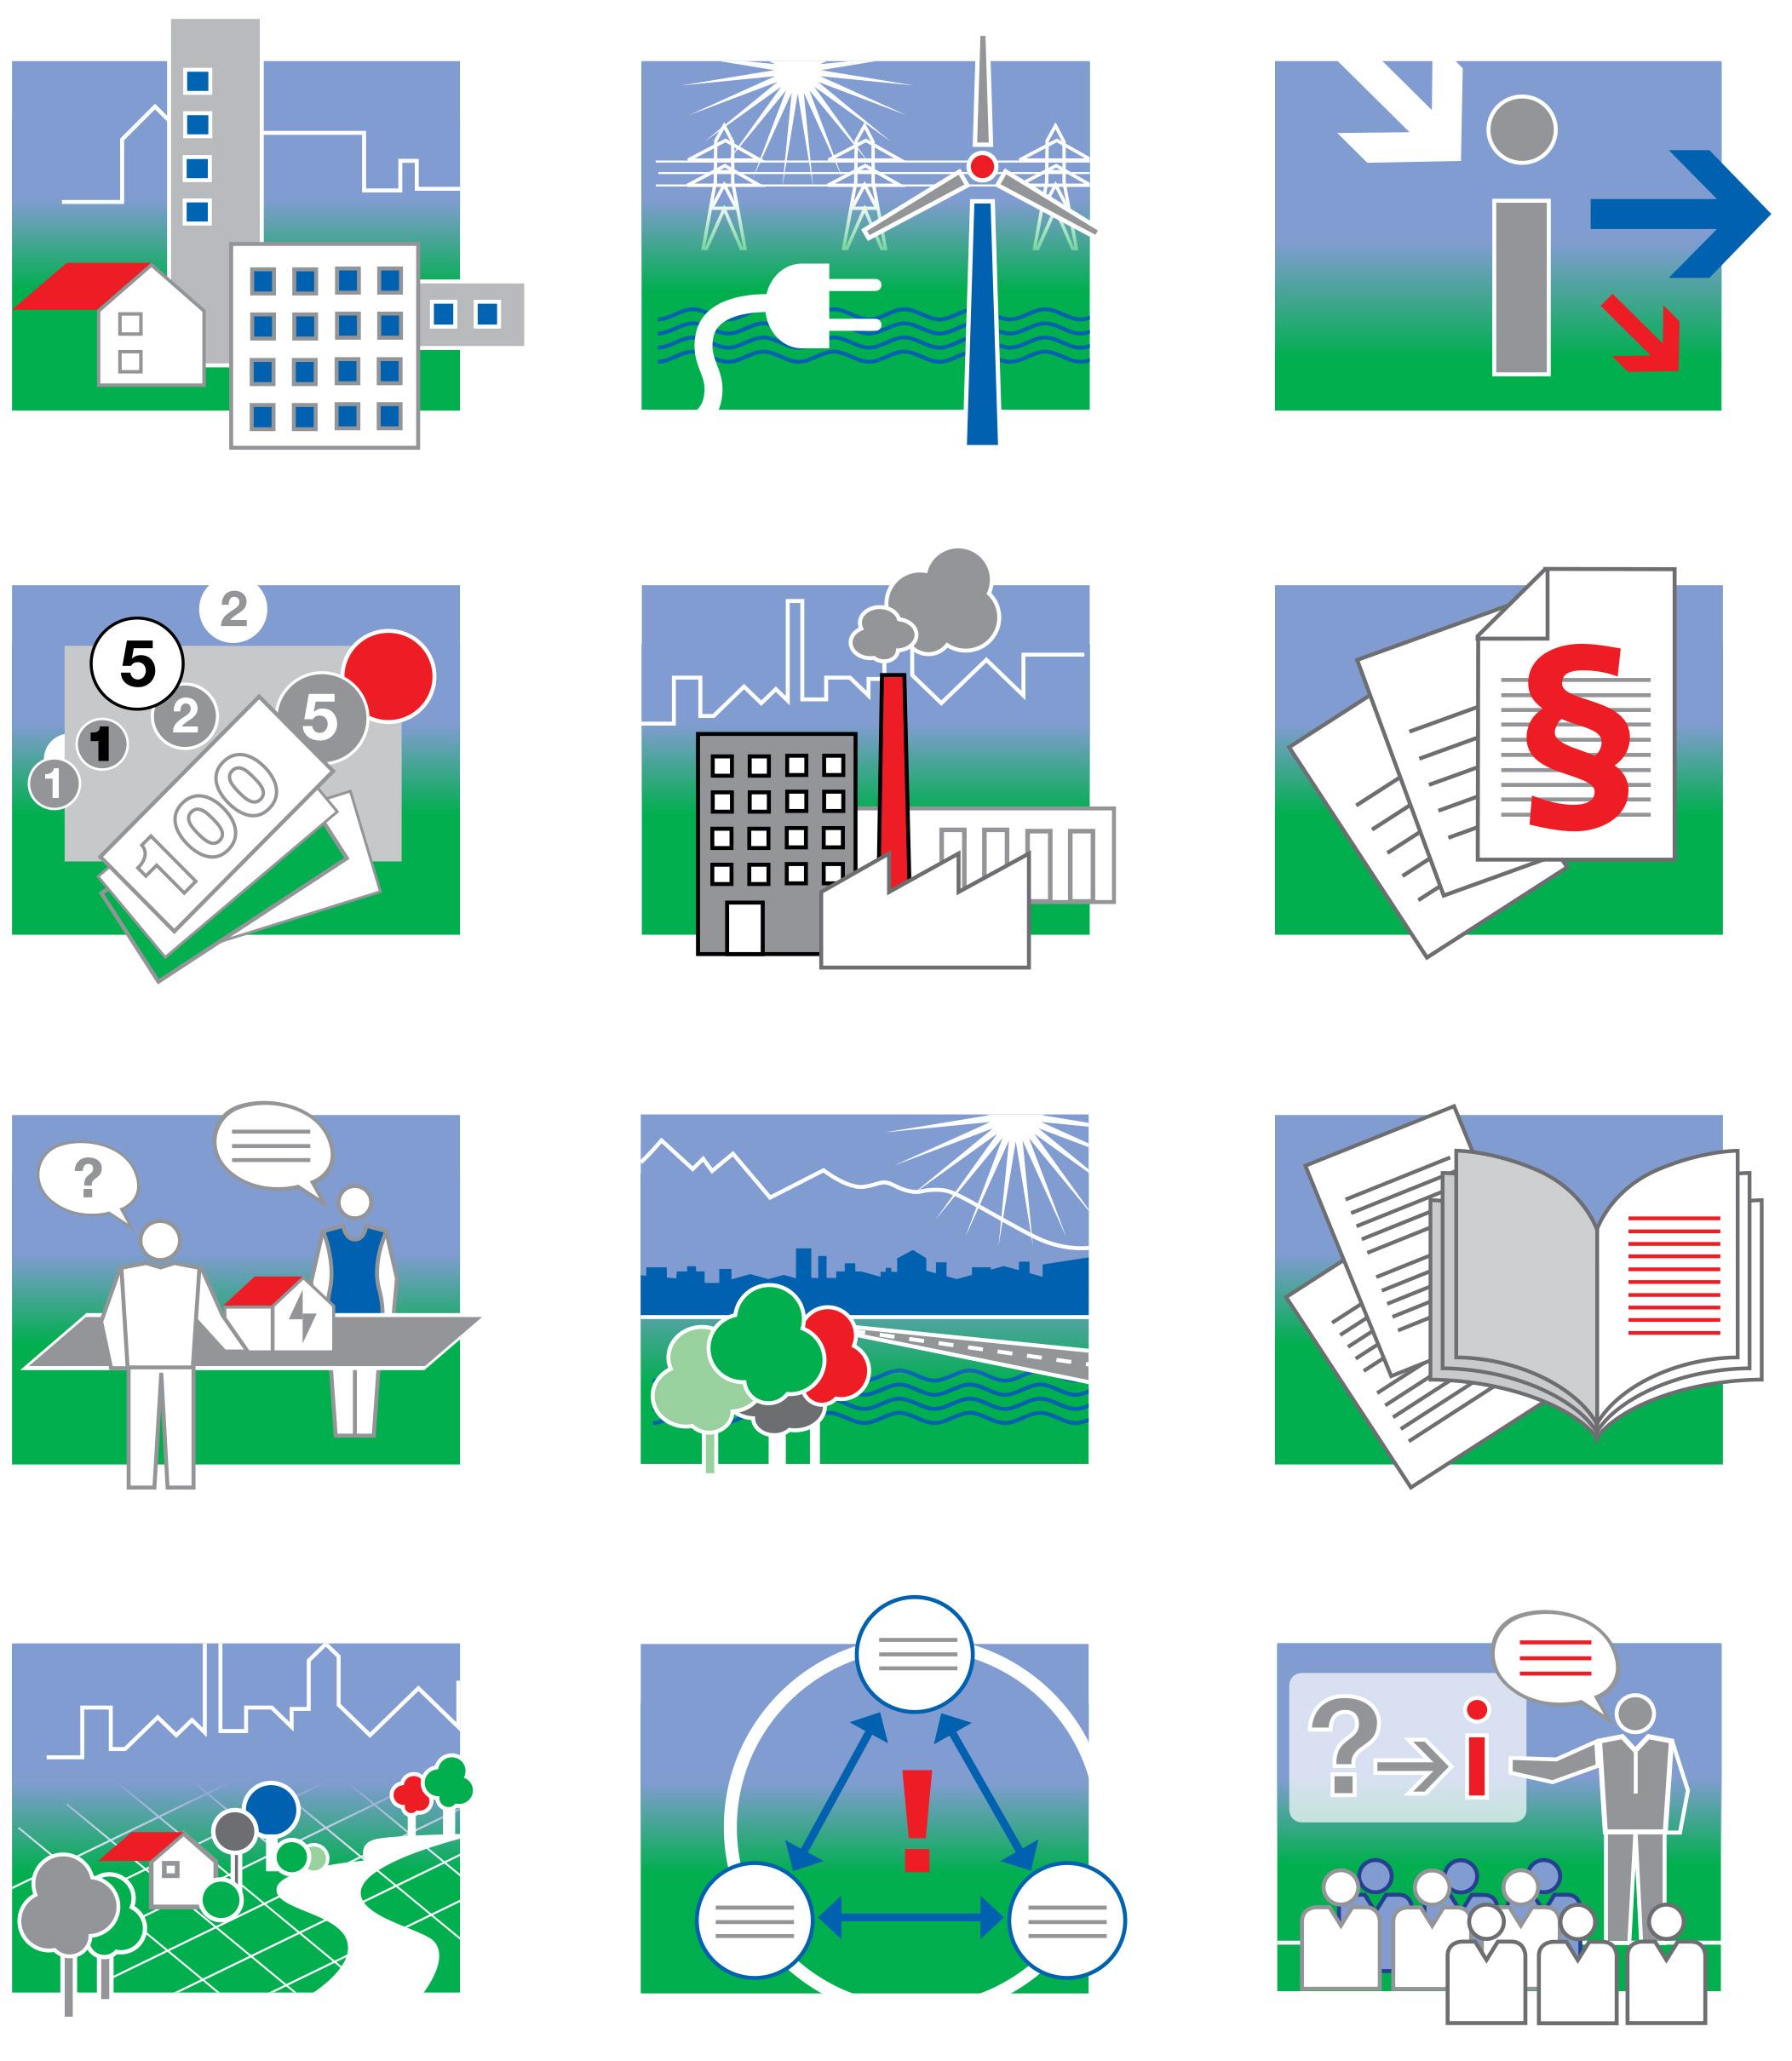 AUE-News-Übersicht-Icons